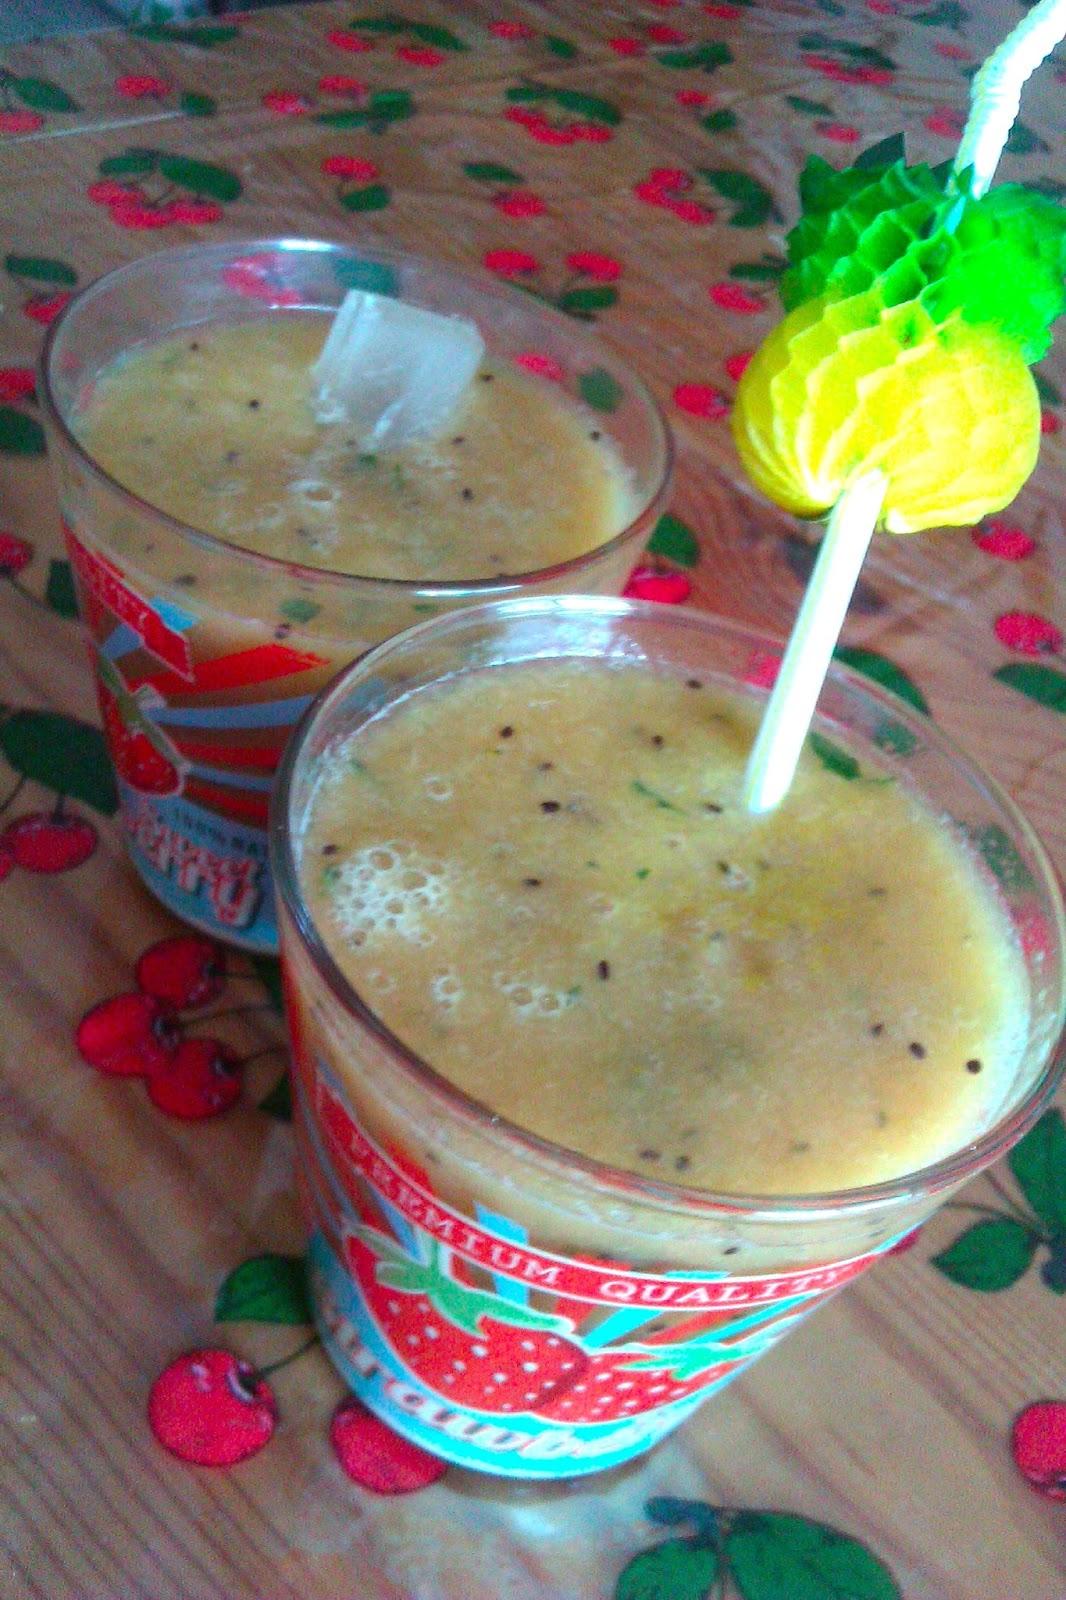 roseisarose recette smoothie melon kiwi menthe. Black Bedroom Furniture Sets. Home Design Ideas